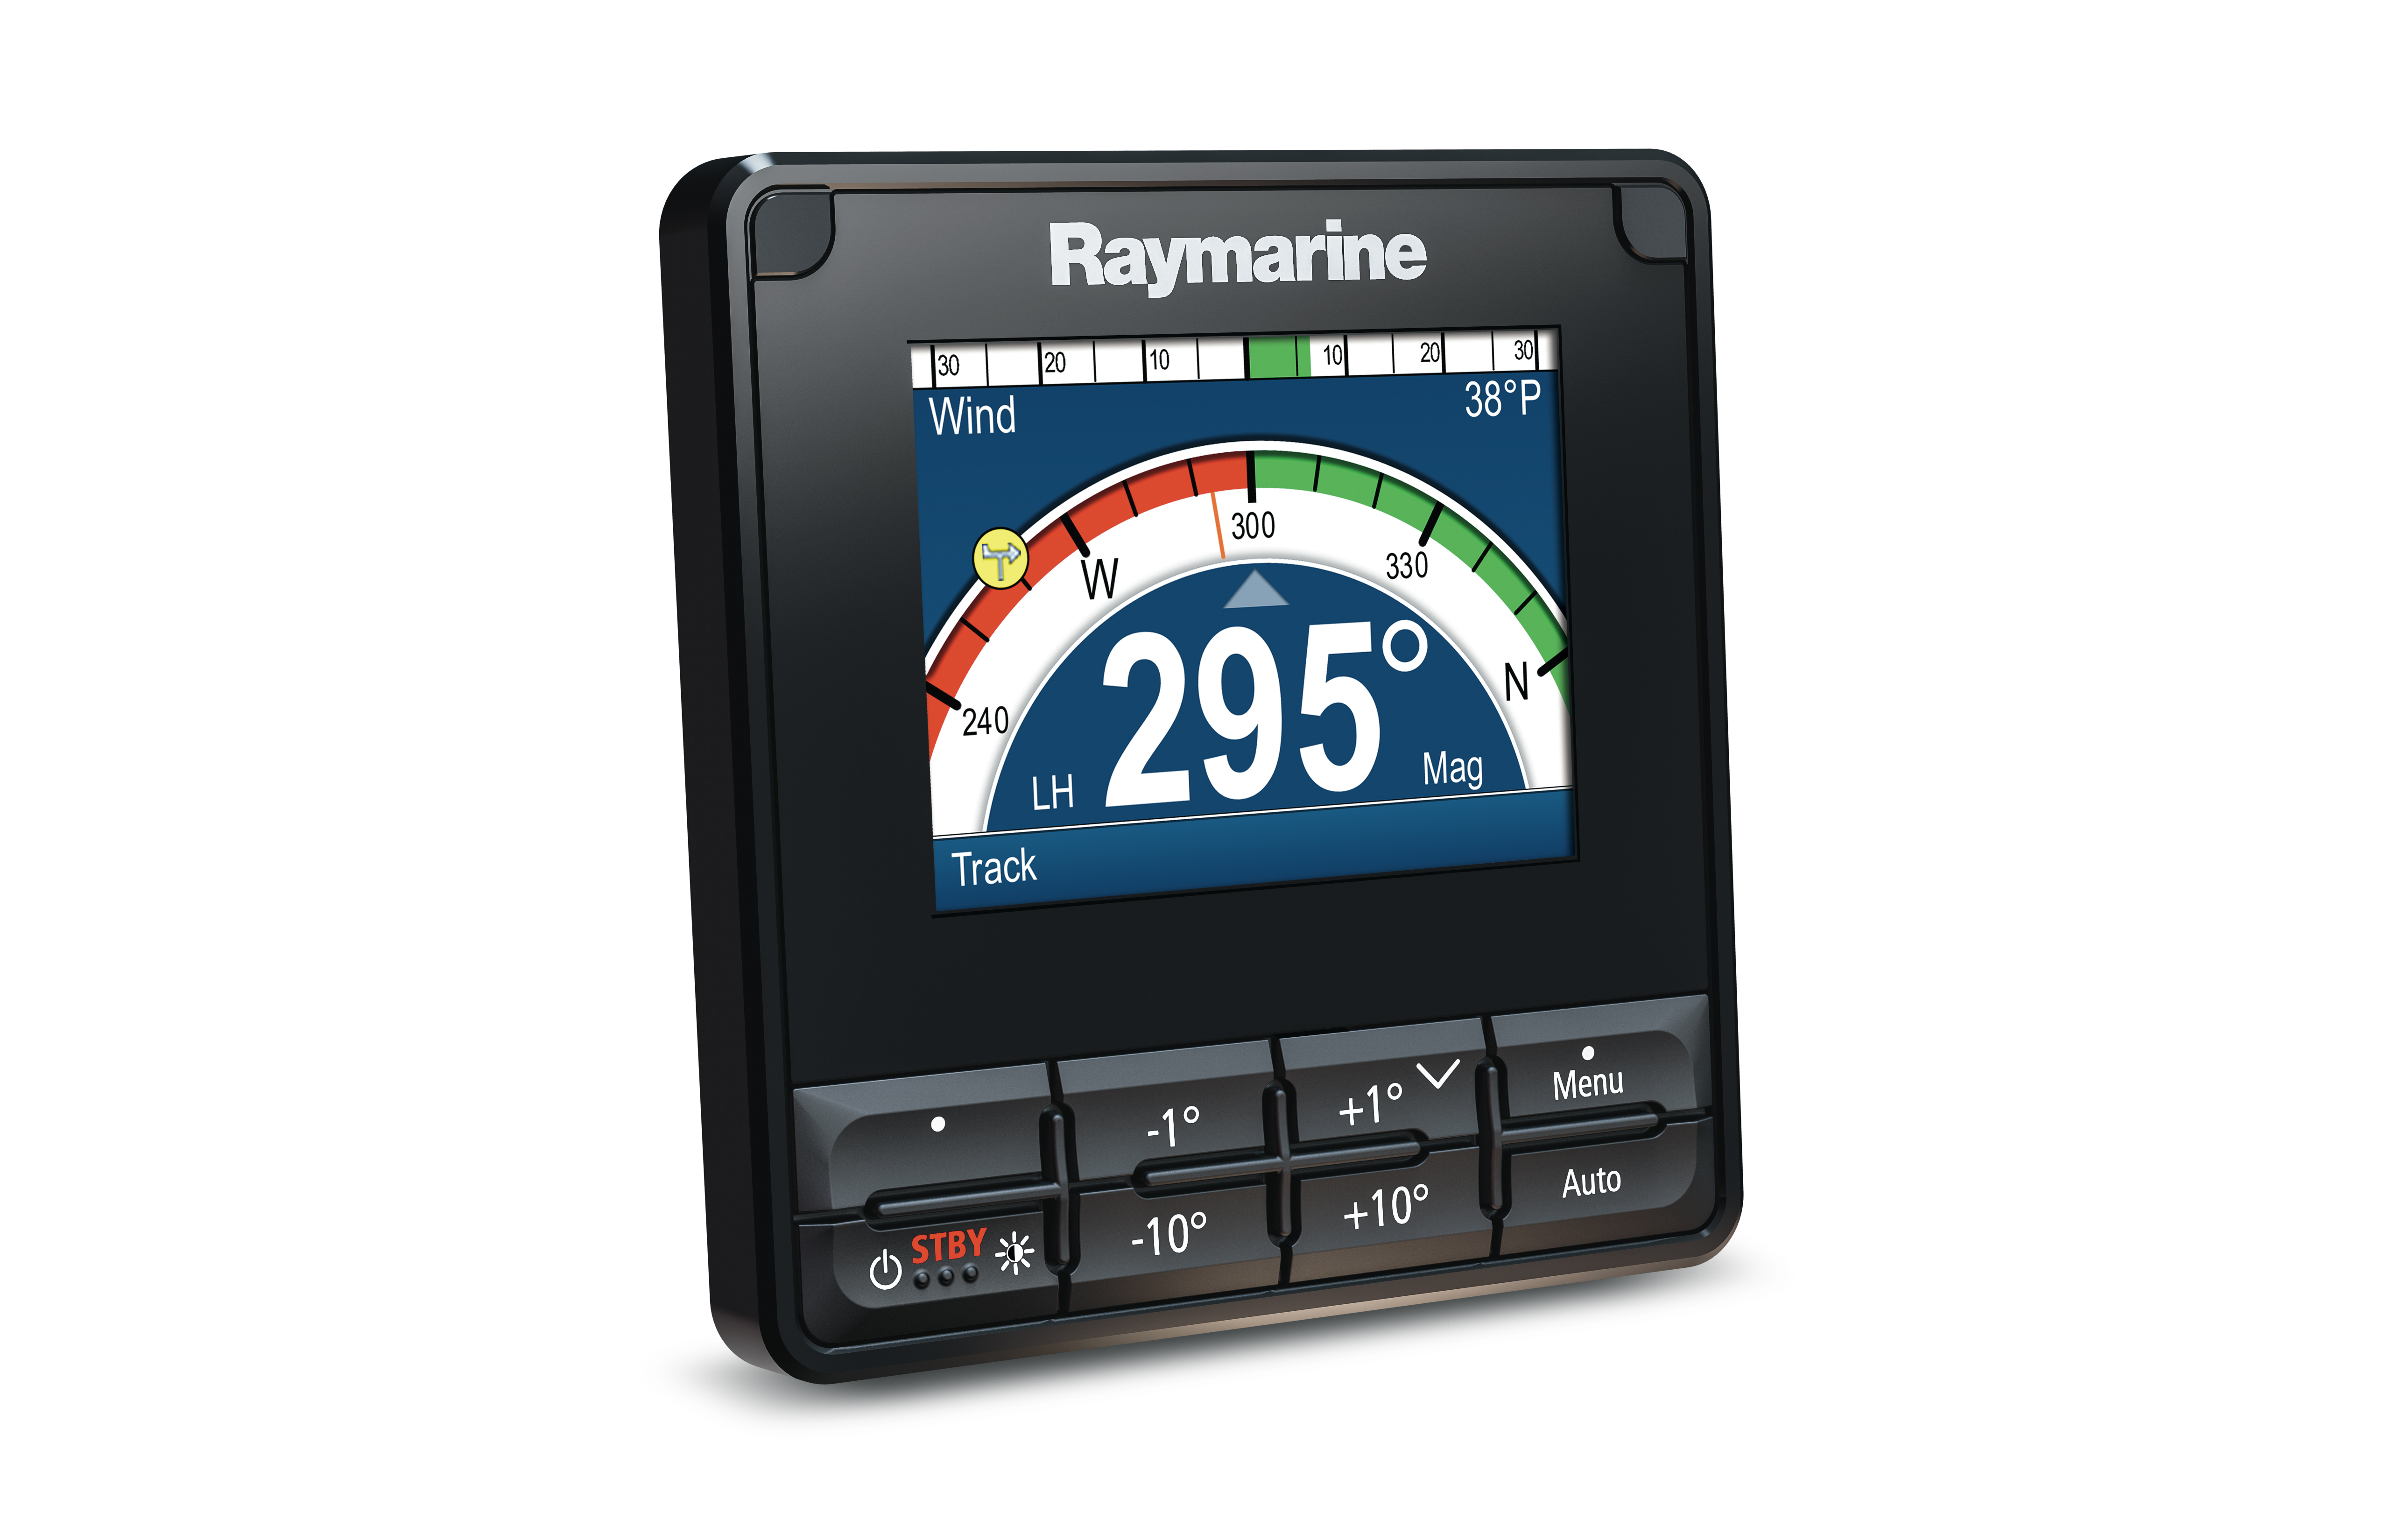 raymarine p70s autopilot control heads left view